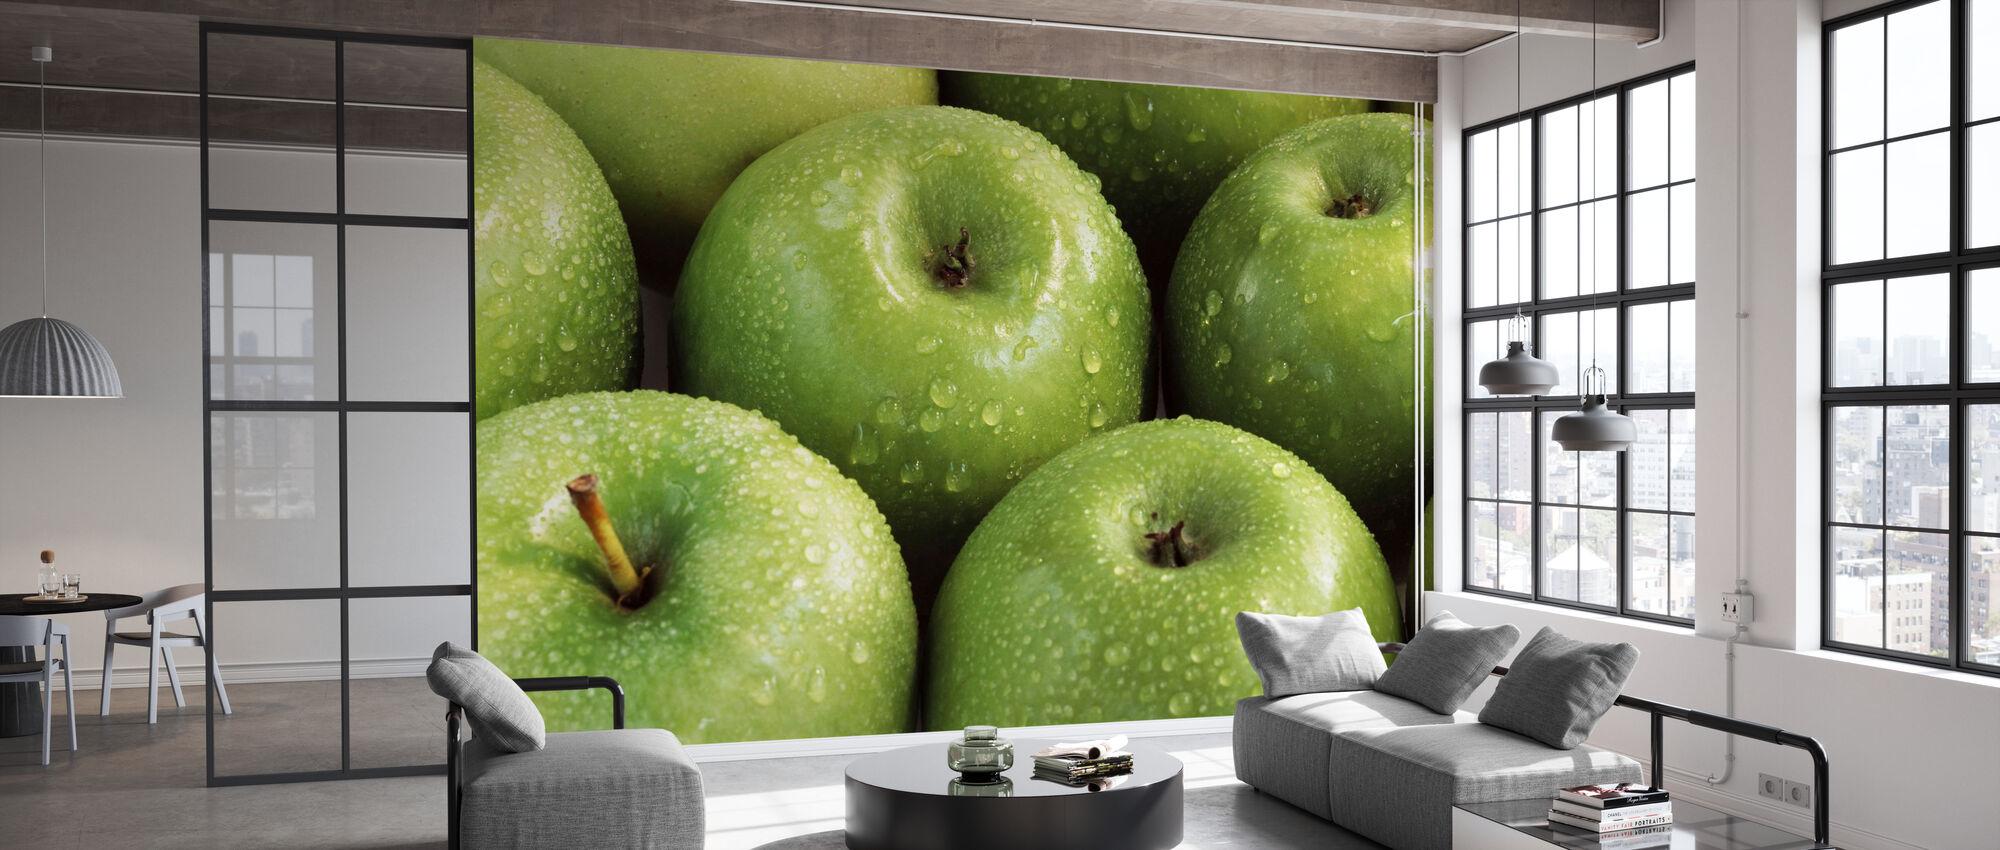 Äpfel - Tapete - Büro